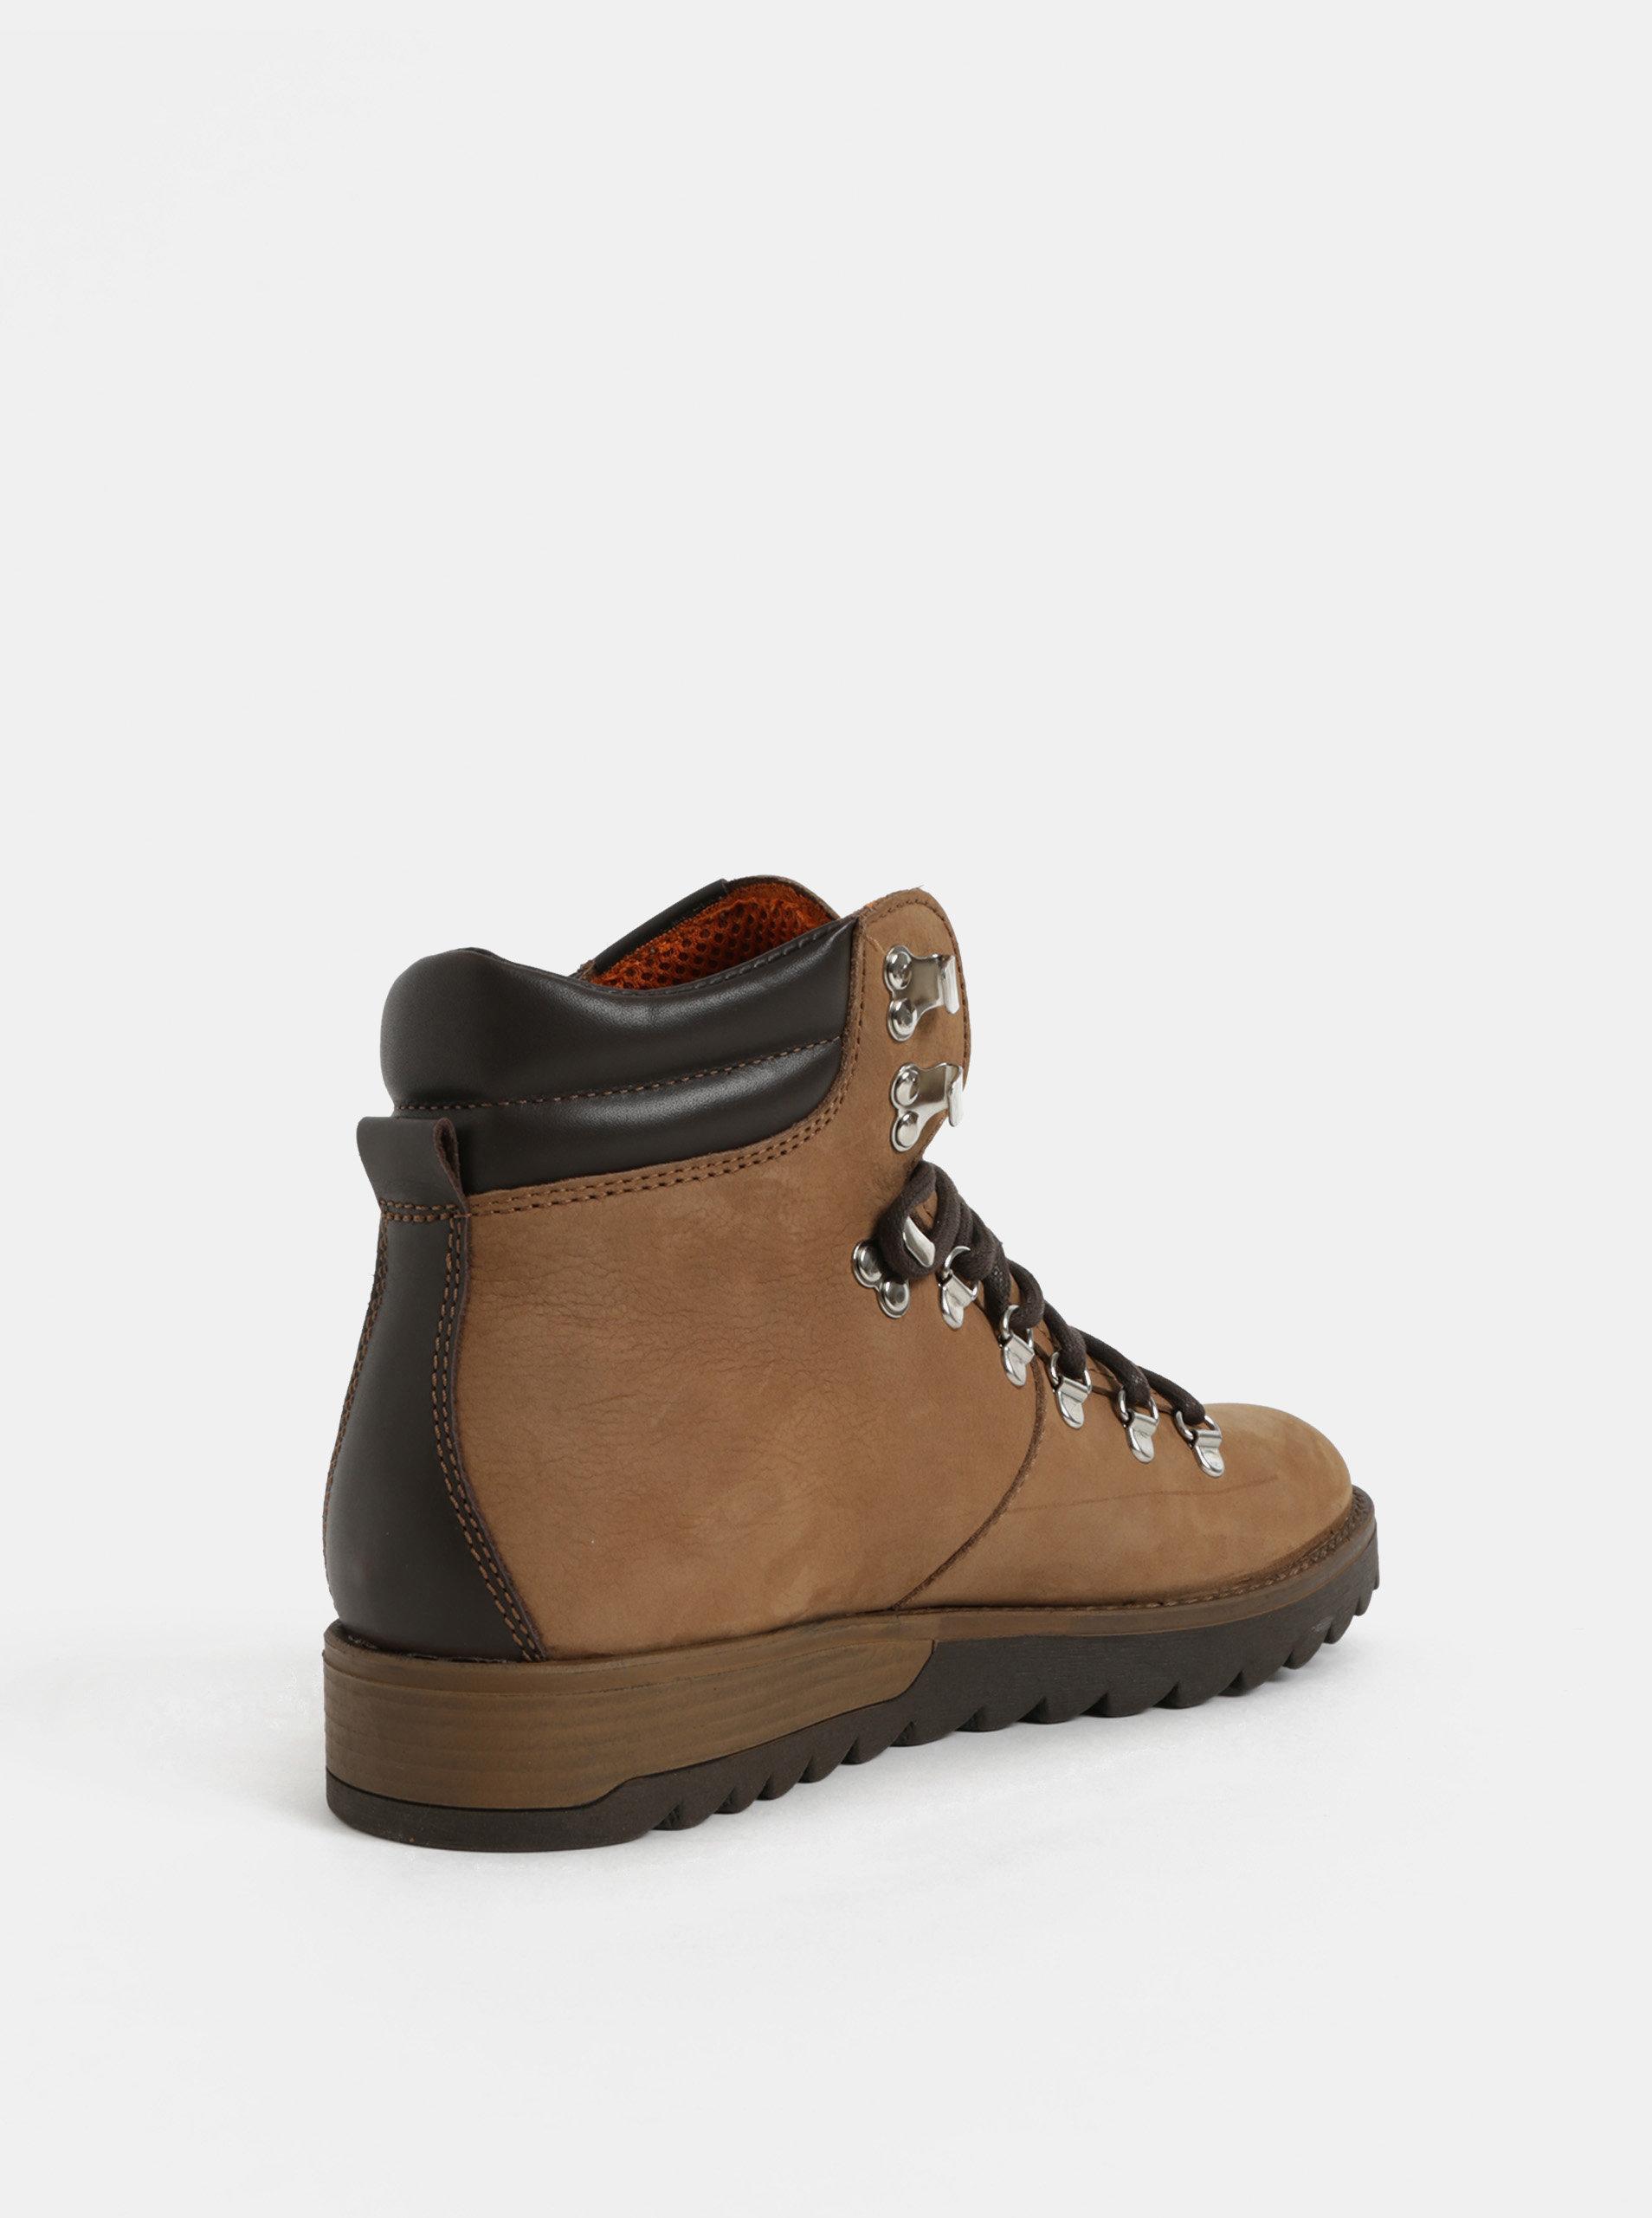 1a79244adb Hnědé pánské kožené kotníkové boty Weinbrenner ...